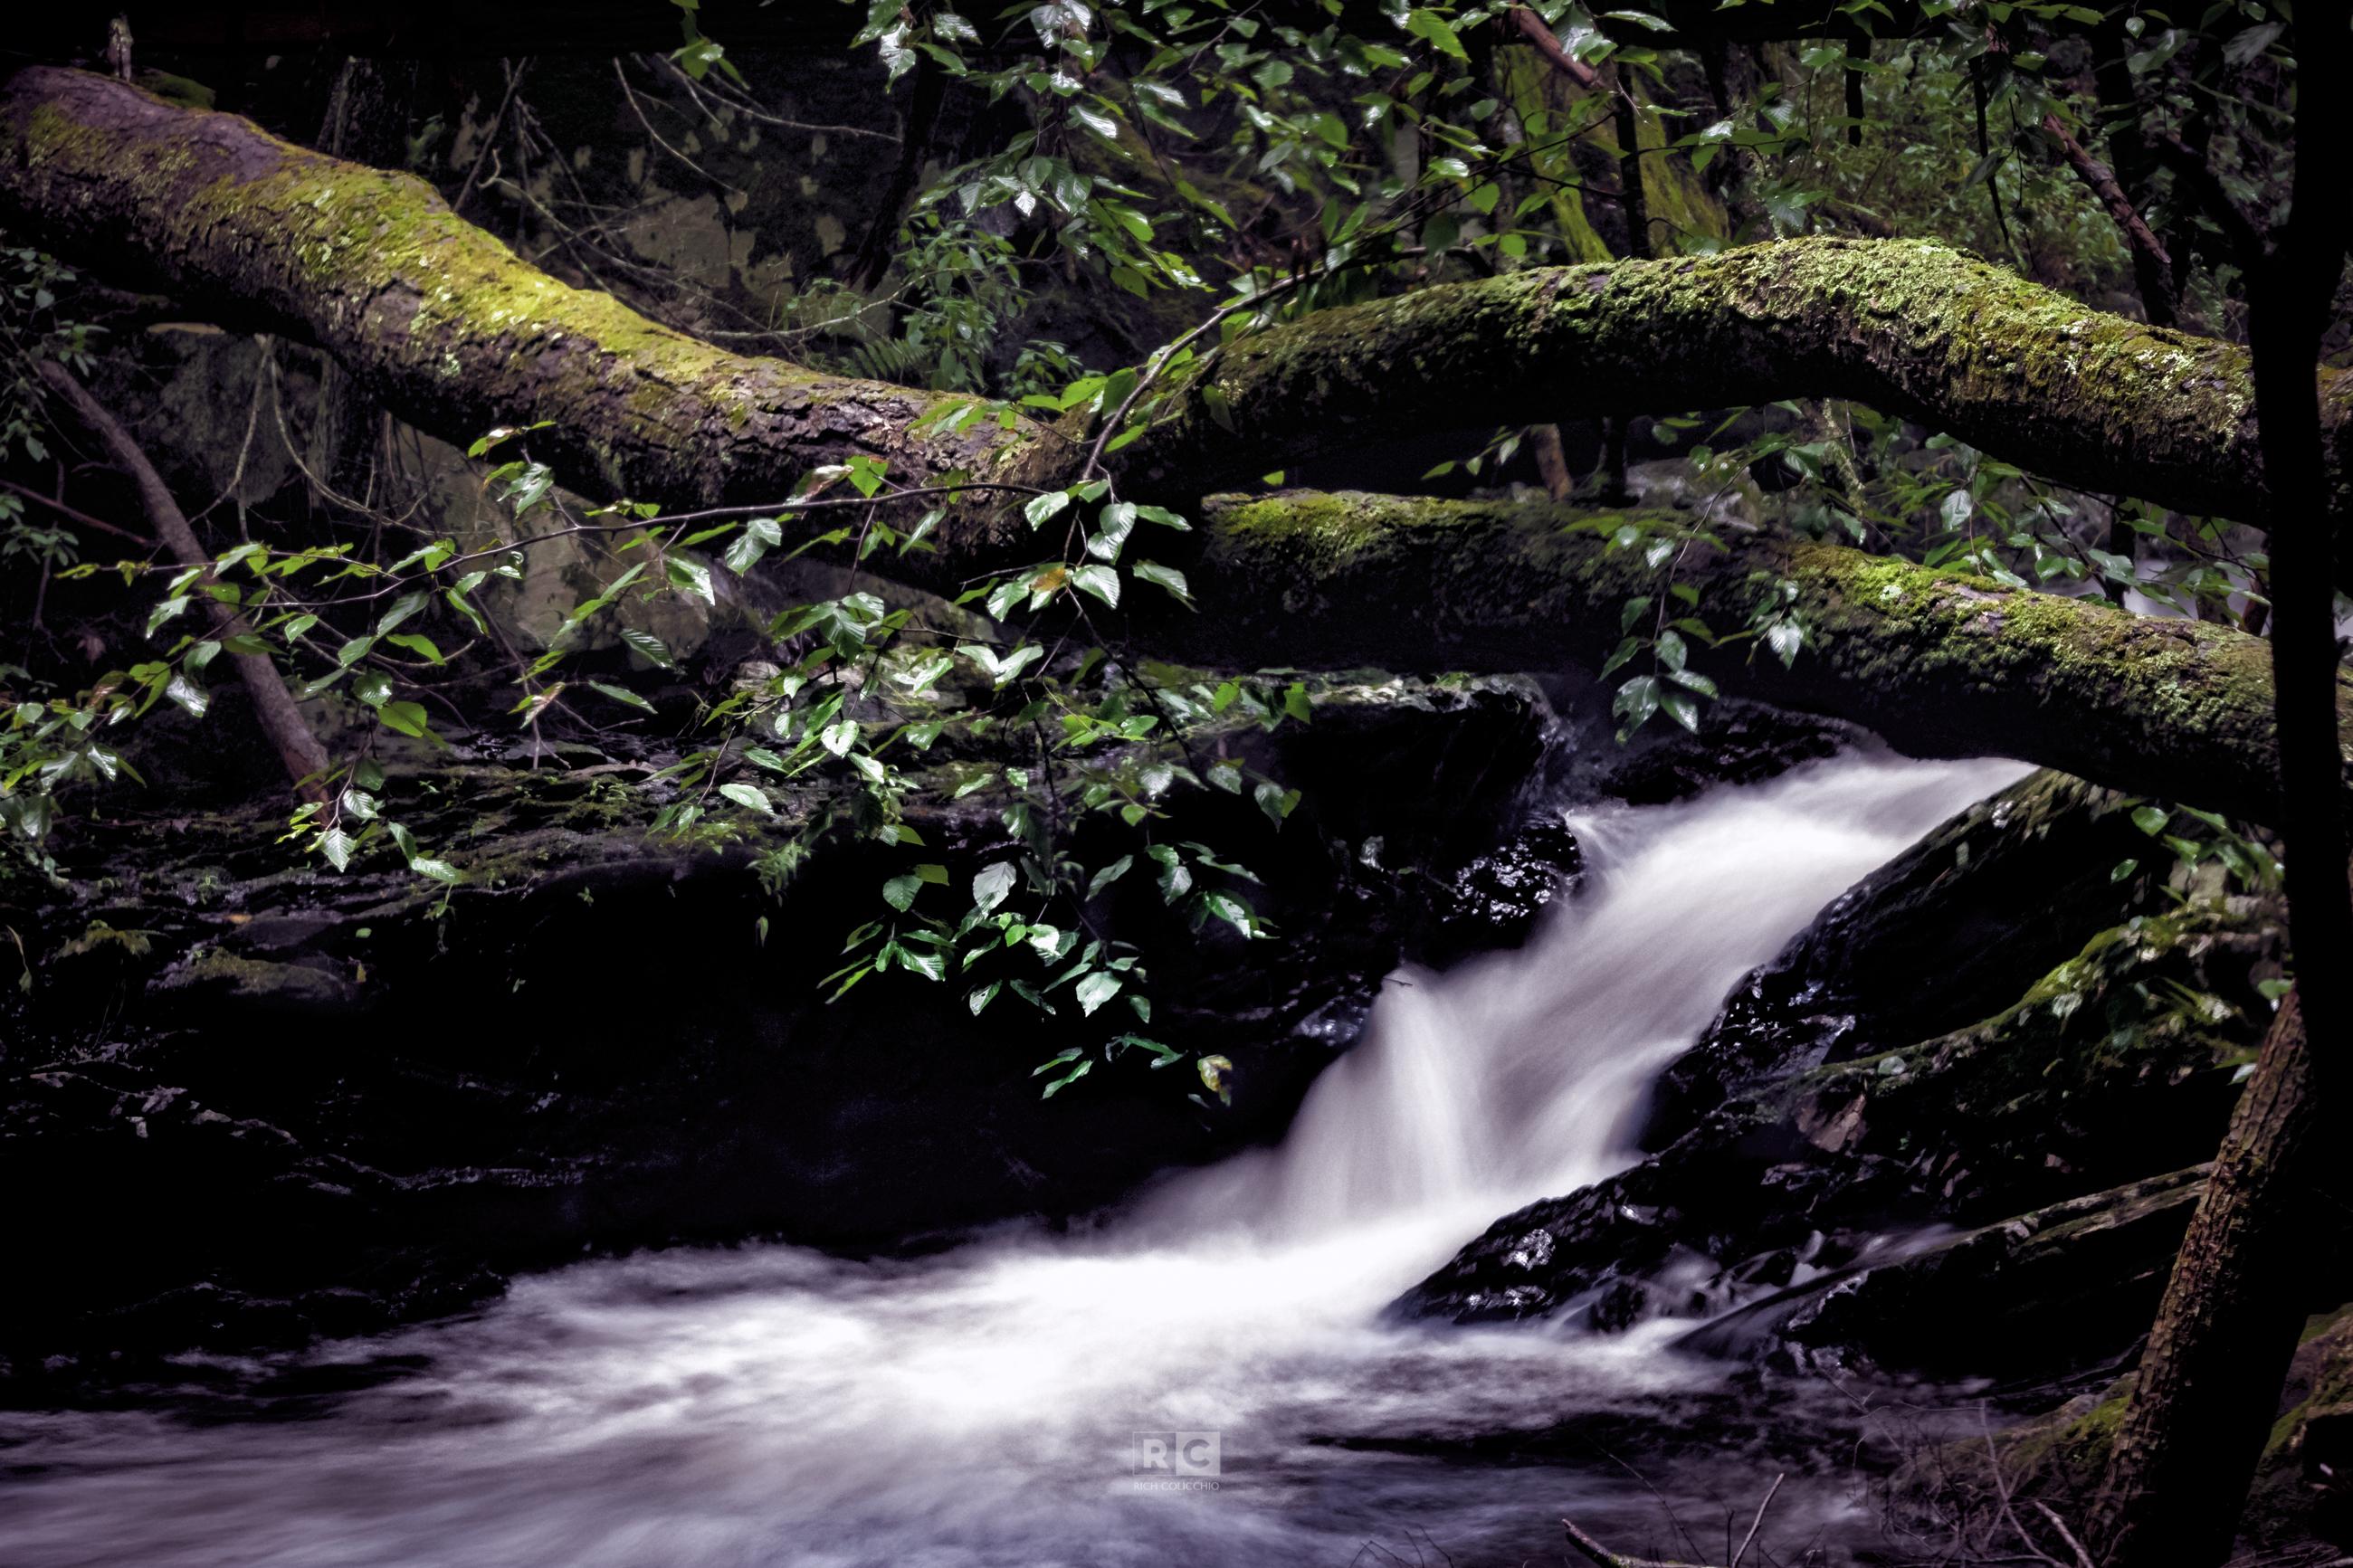 Kettletown State Park